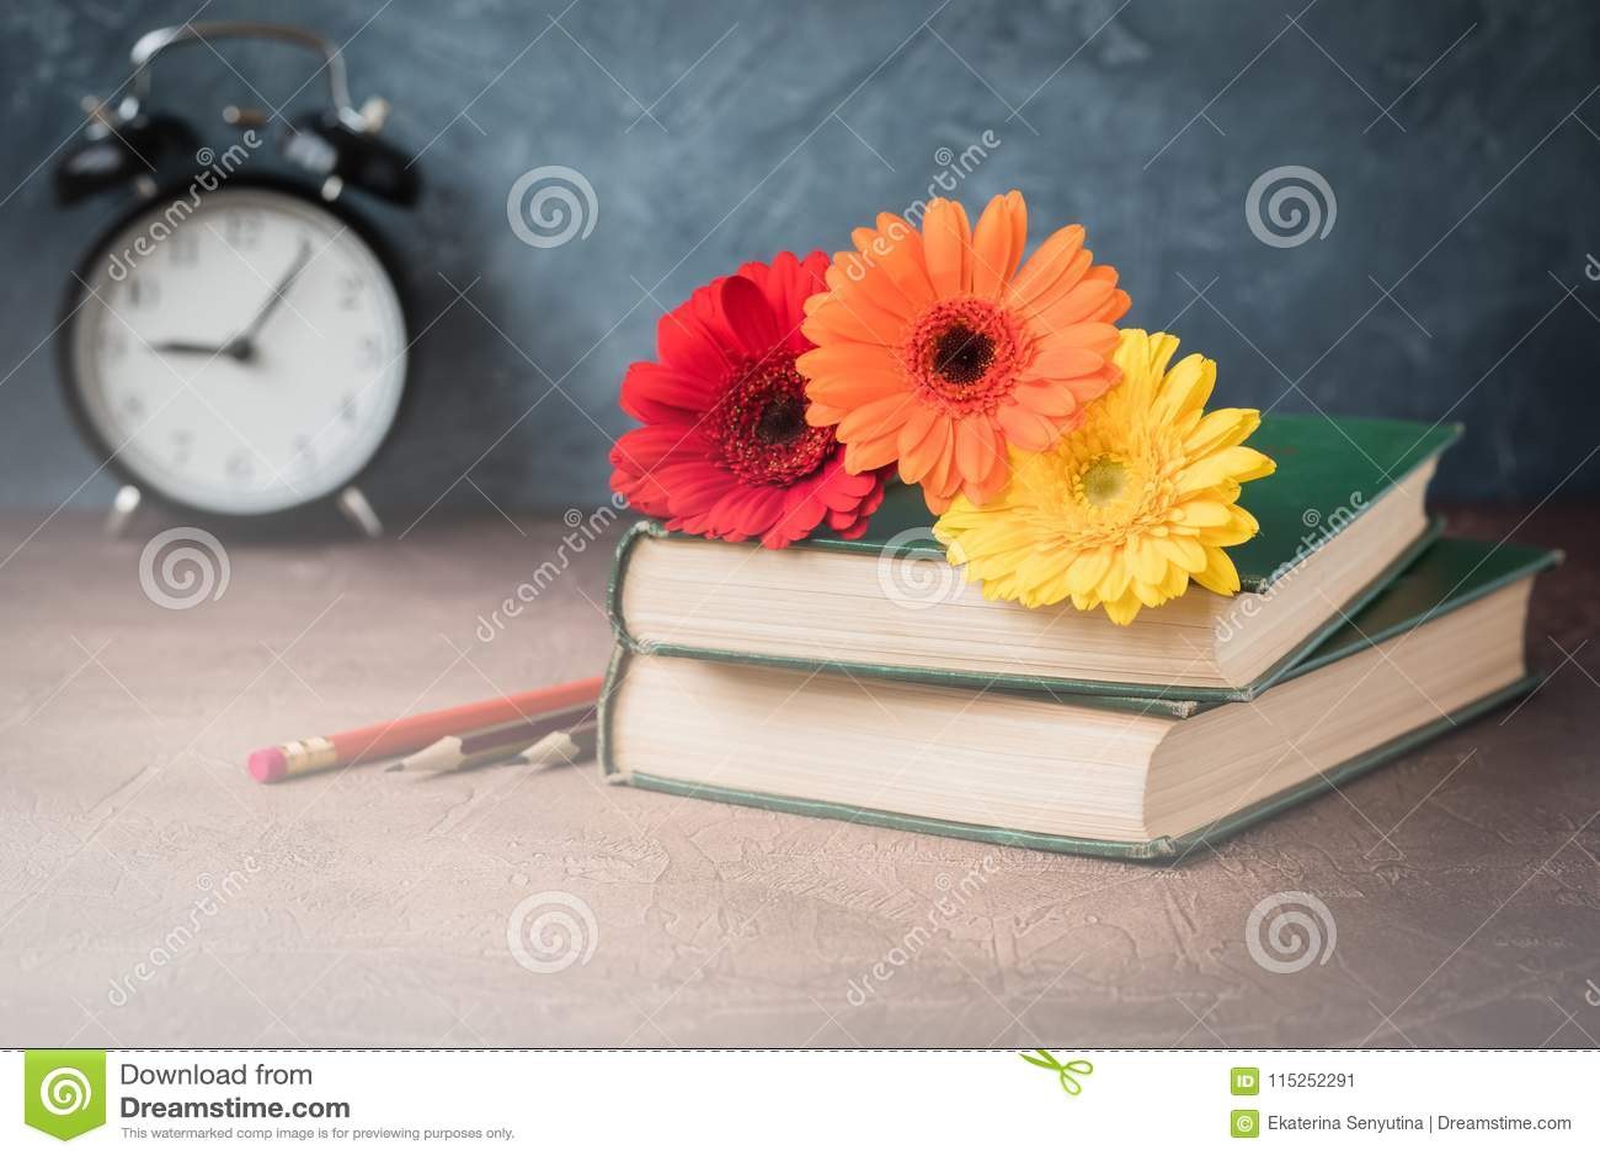 September 1 Concept Postcard Teachers Day Back To School Supplies